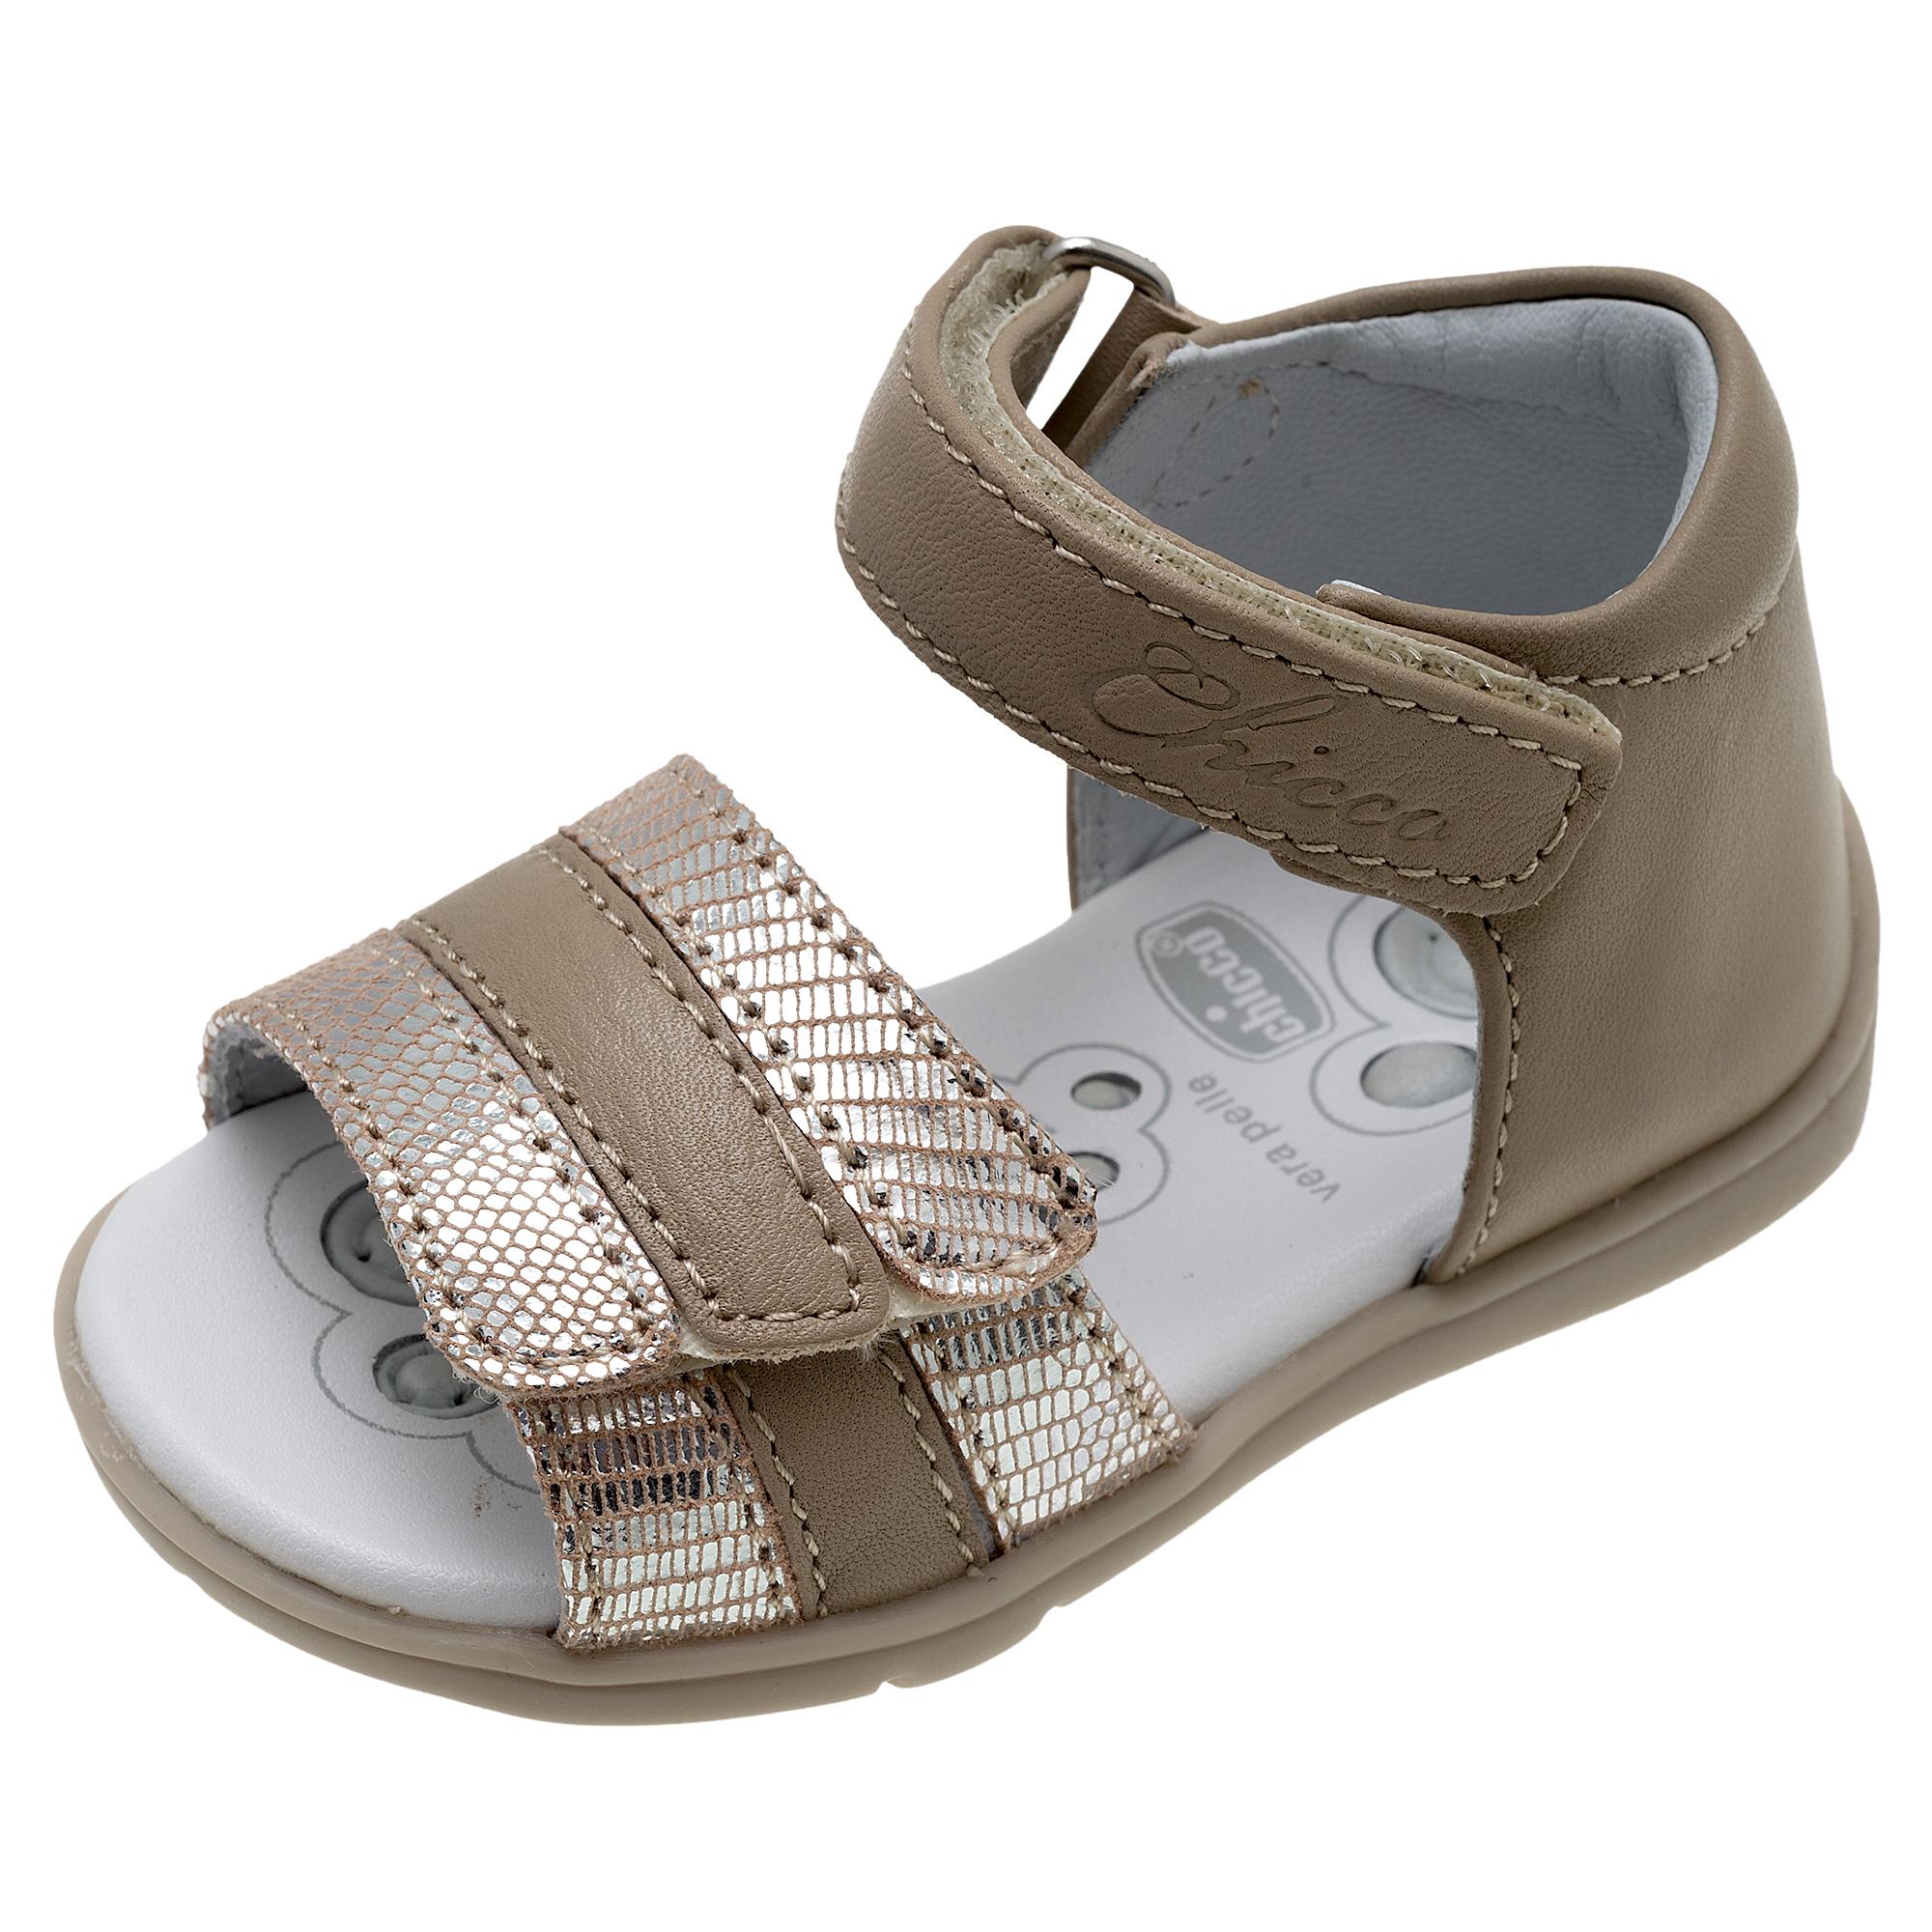 Sandale Fetite Chicco Ginevras, Piele Bej, 61480 imagine